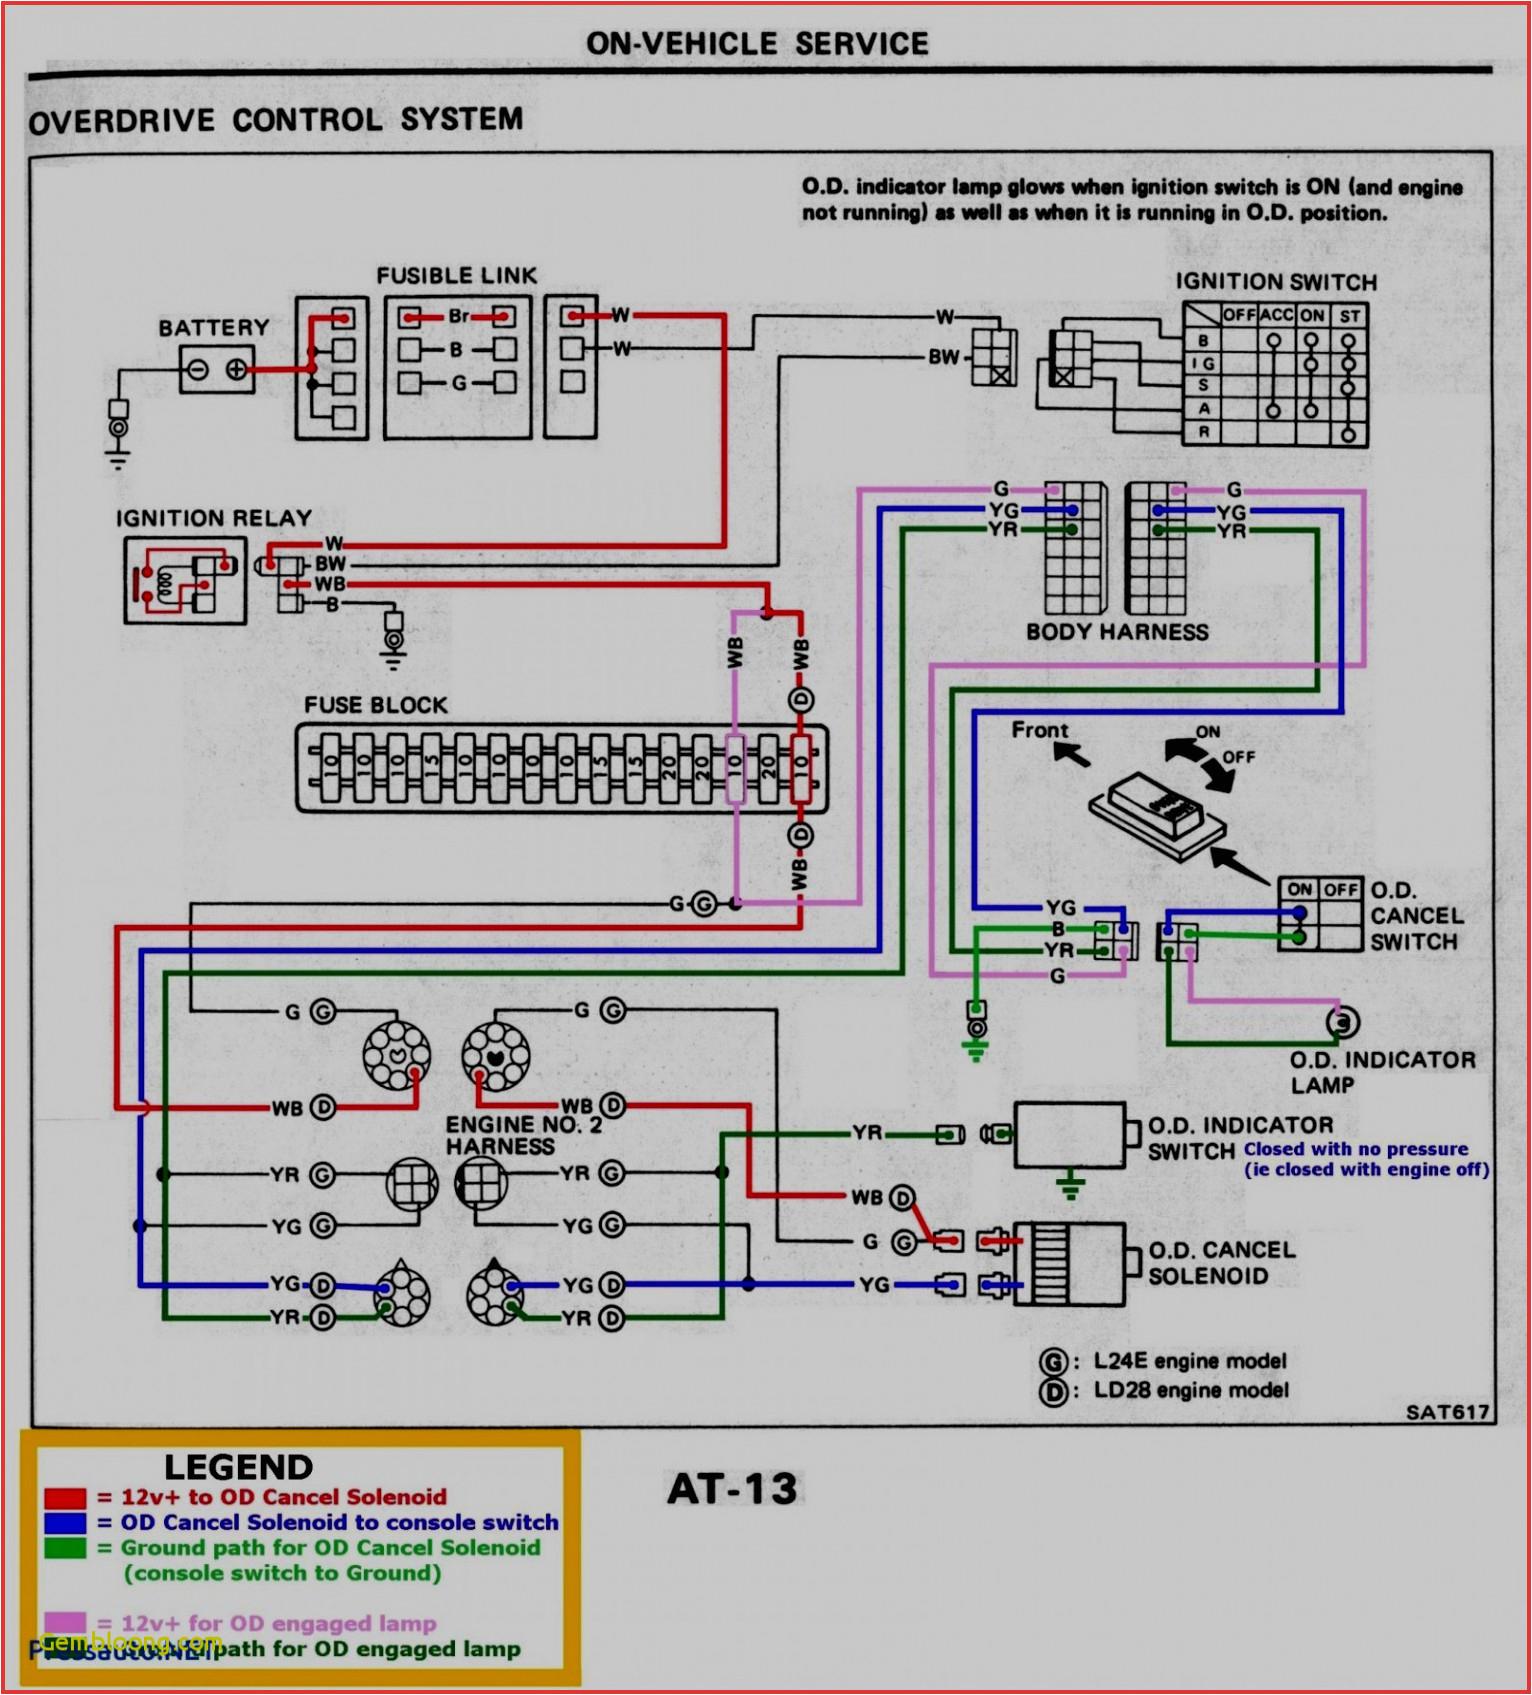 1976 ford 3000 wiring diagram wiring diagrams long 1976 ford 3000 wiring diagram